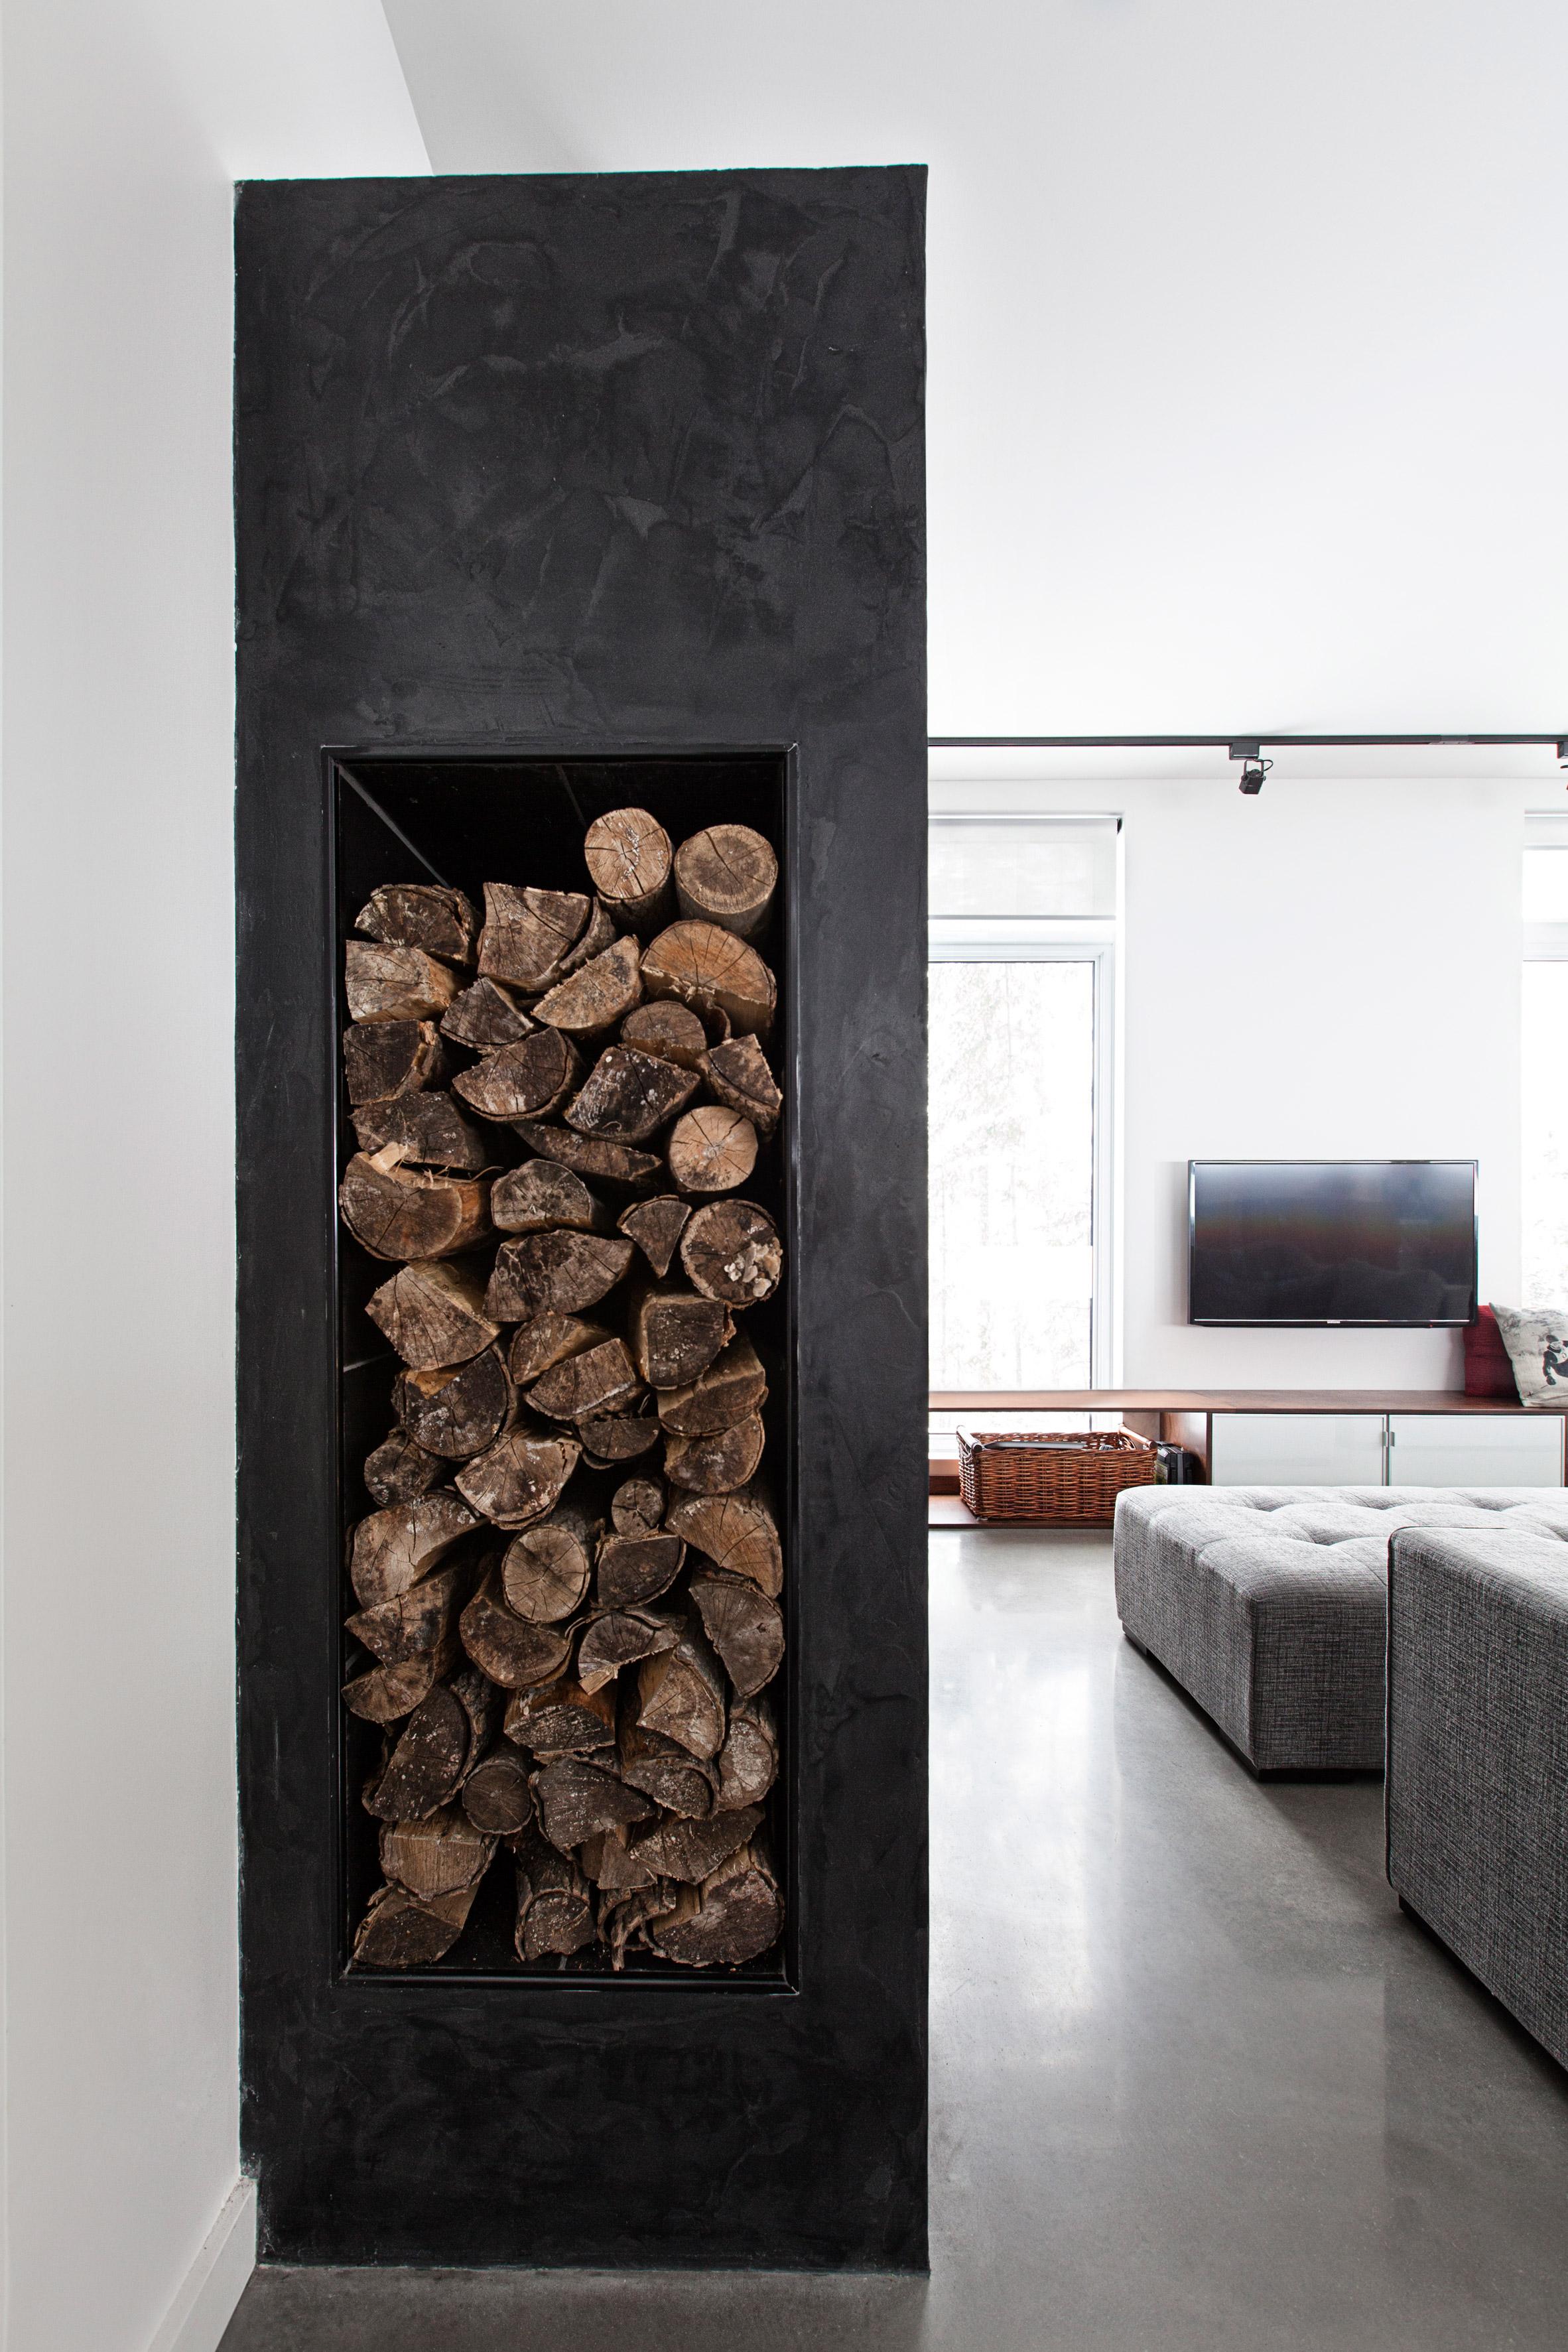 residential-ski-lodge-kltz-design-interiors-quebec-canada_dezainaa.jpg